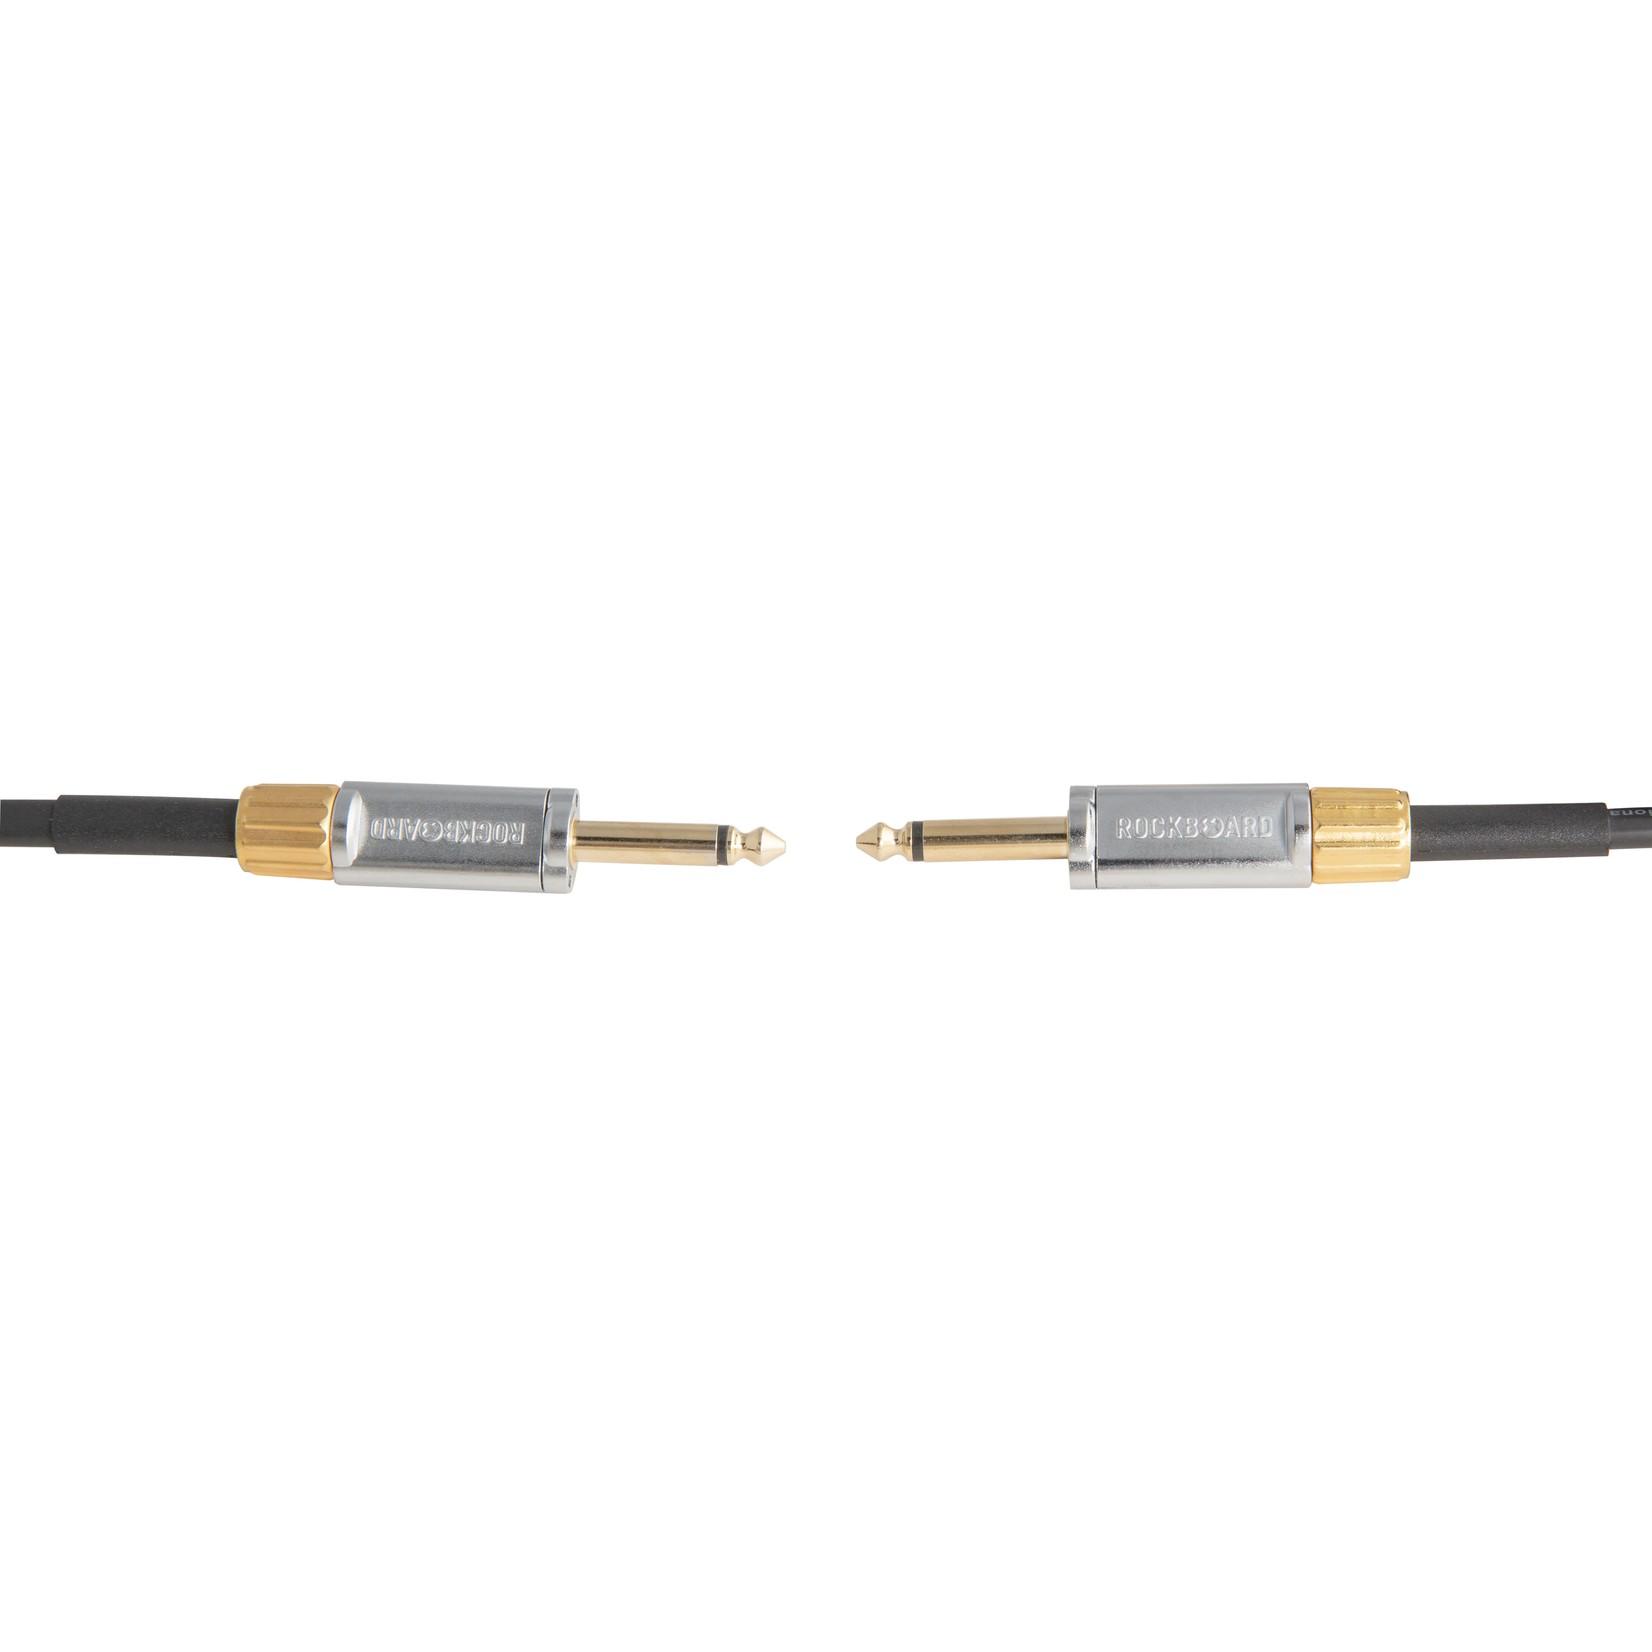 Rockboard RockBoard PREMIUM Flat Instrument Cable, 300 cm / 9.8 ft., straight/straight